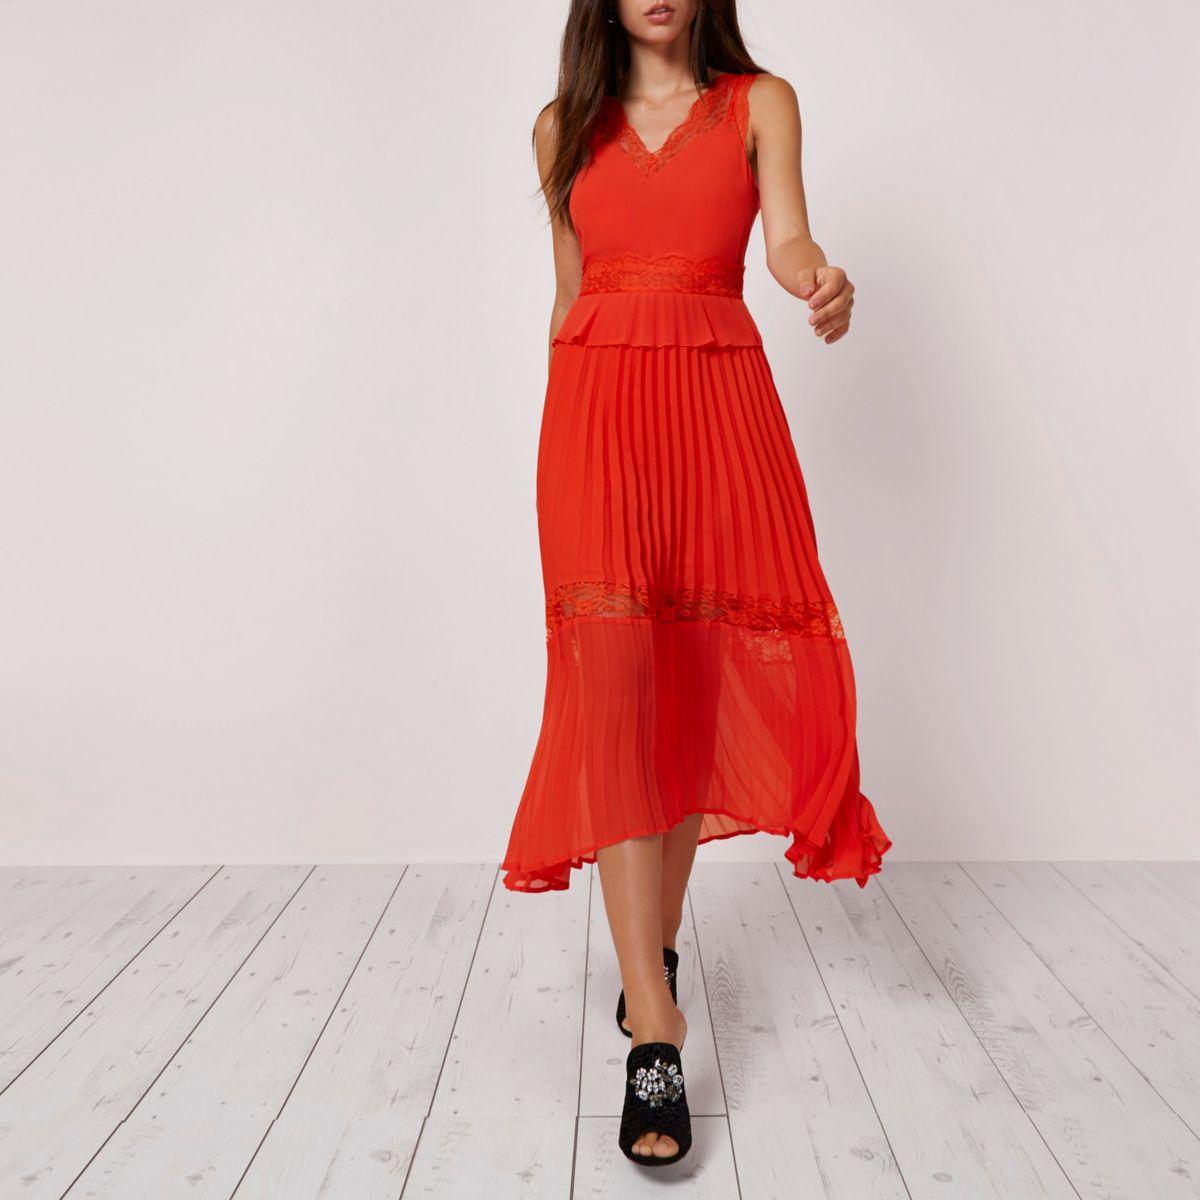 Orange pleated skirt lace trim dress